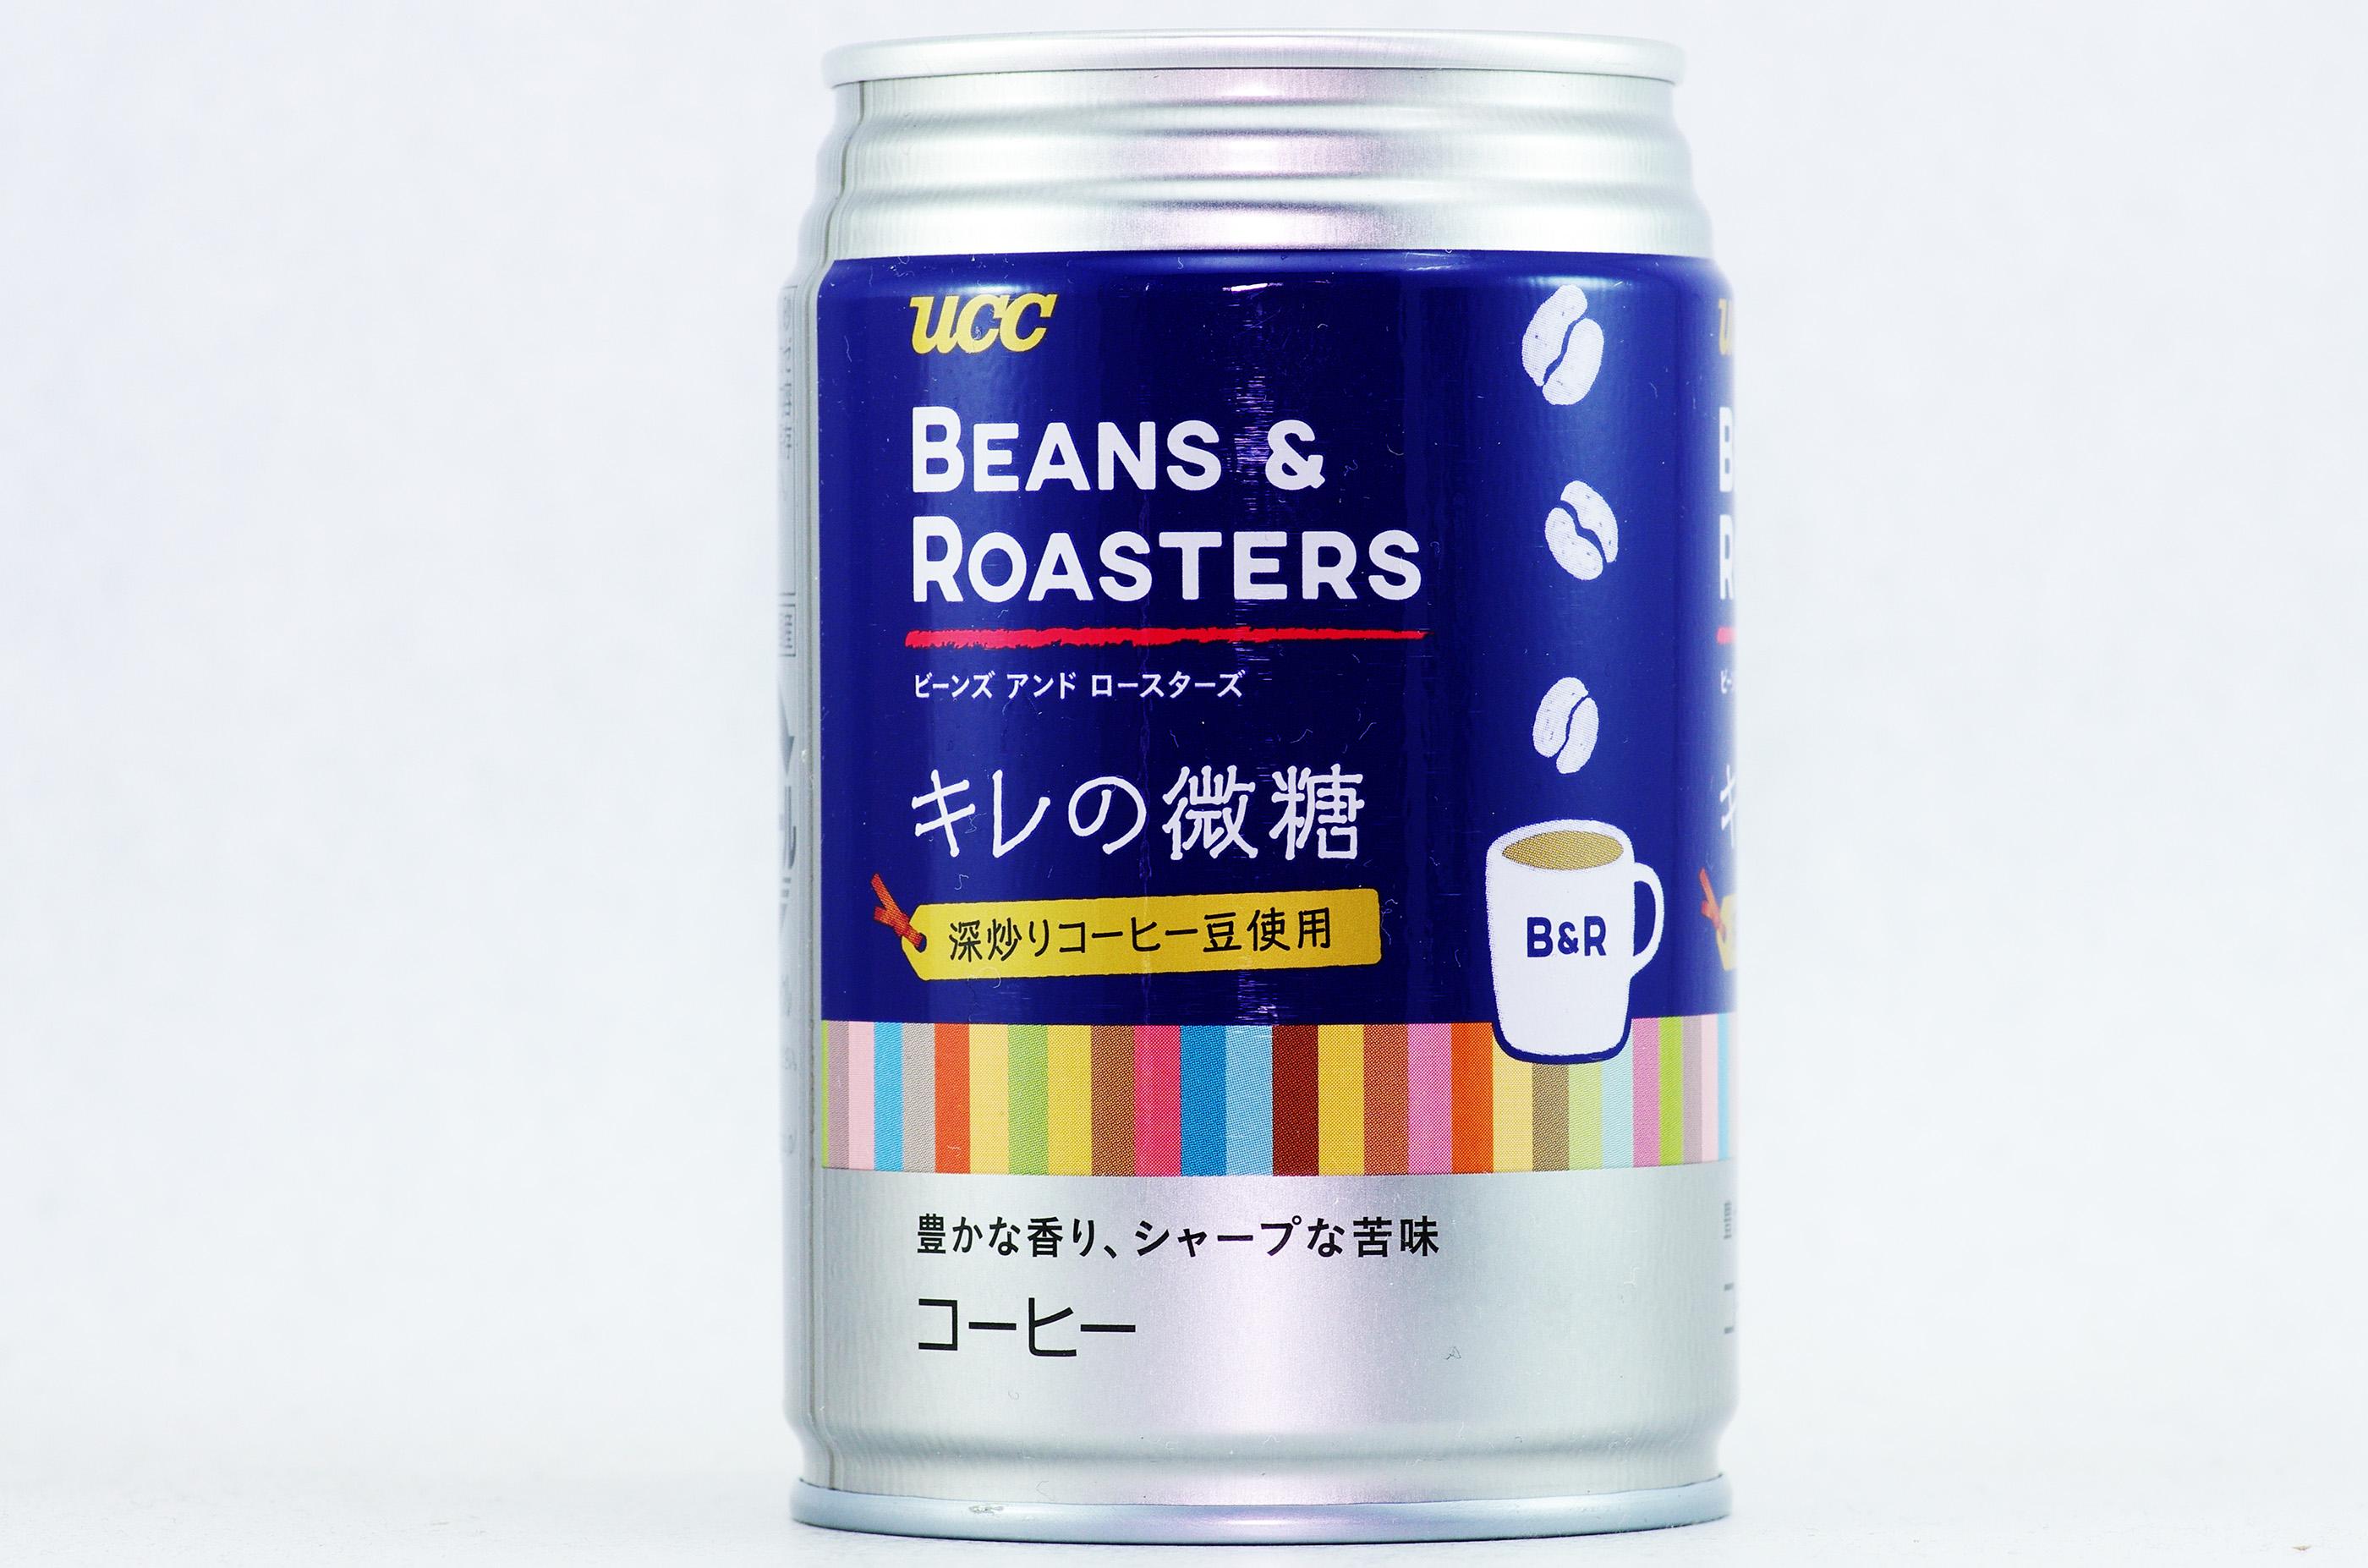 UCC BEANS & ROASTERS キレの微糖 2018年11月